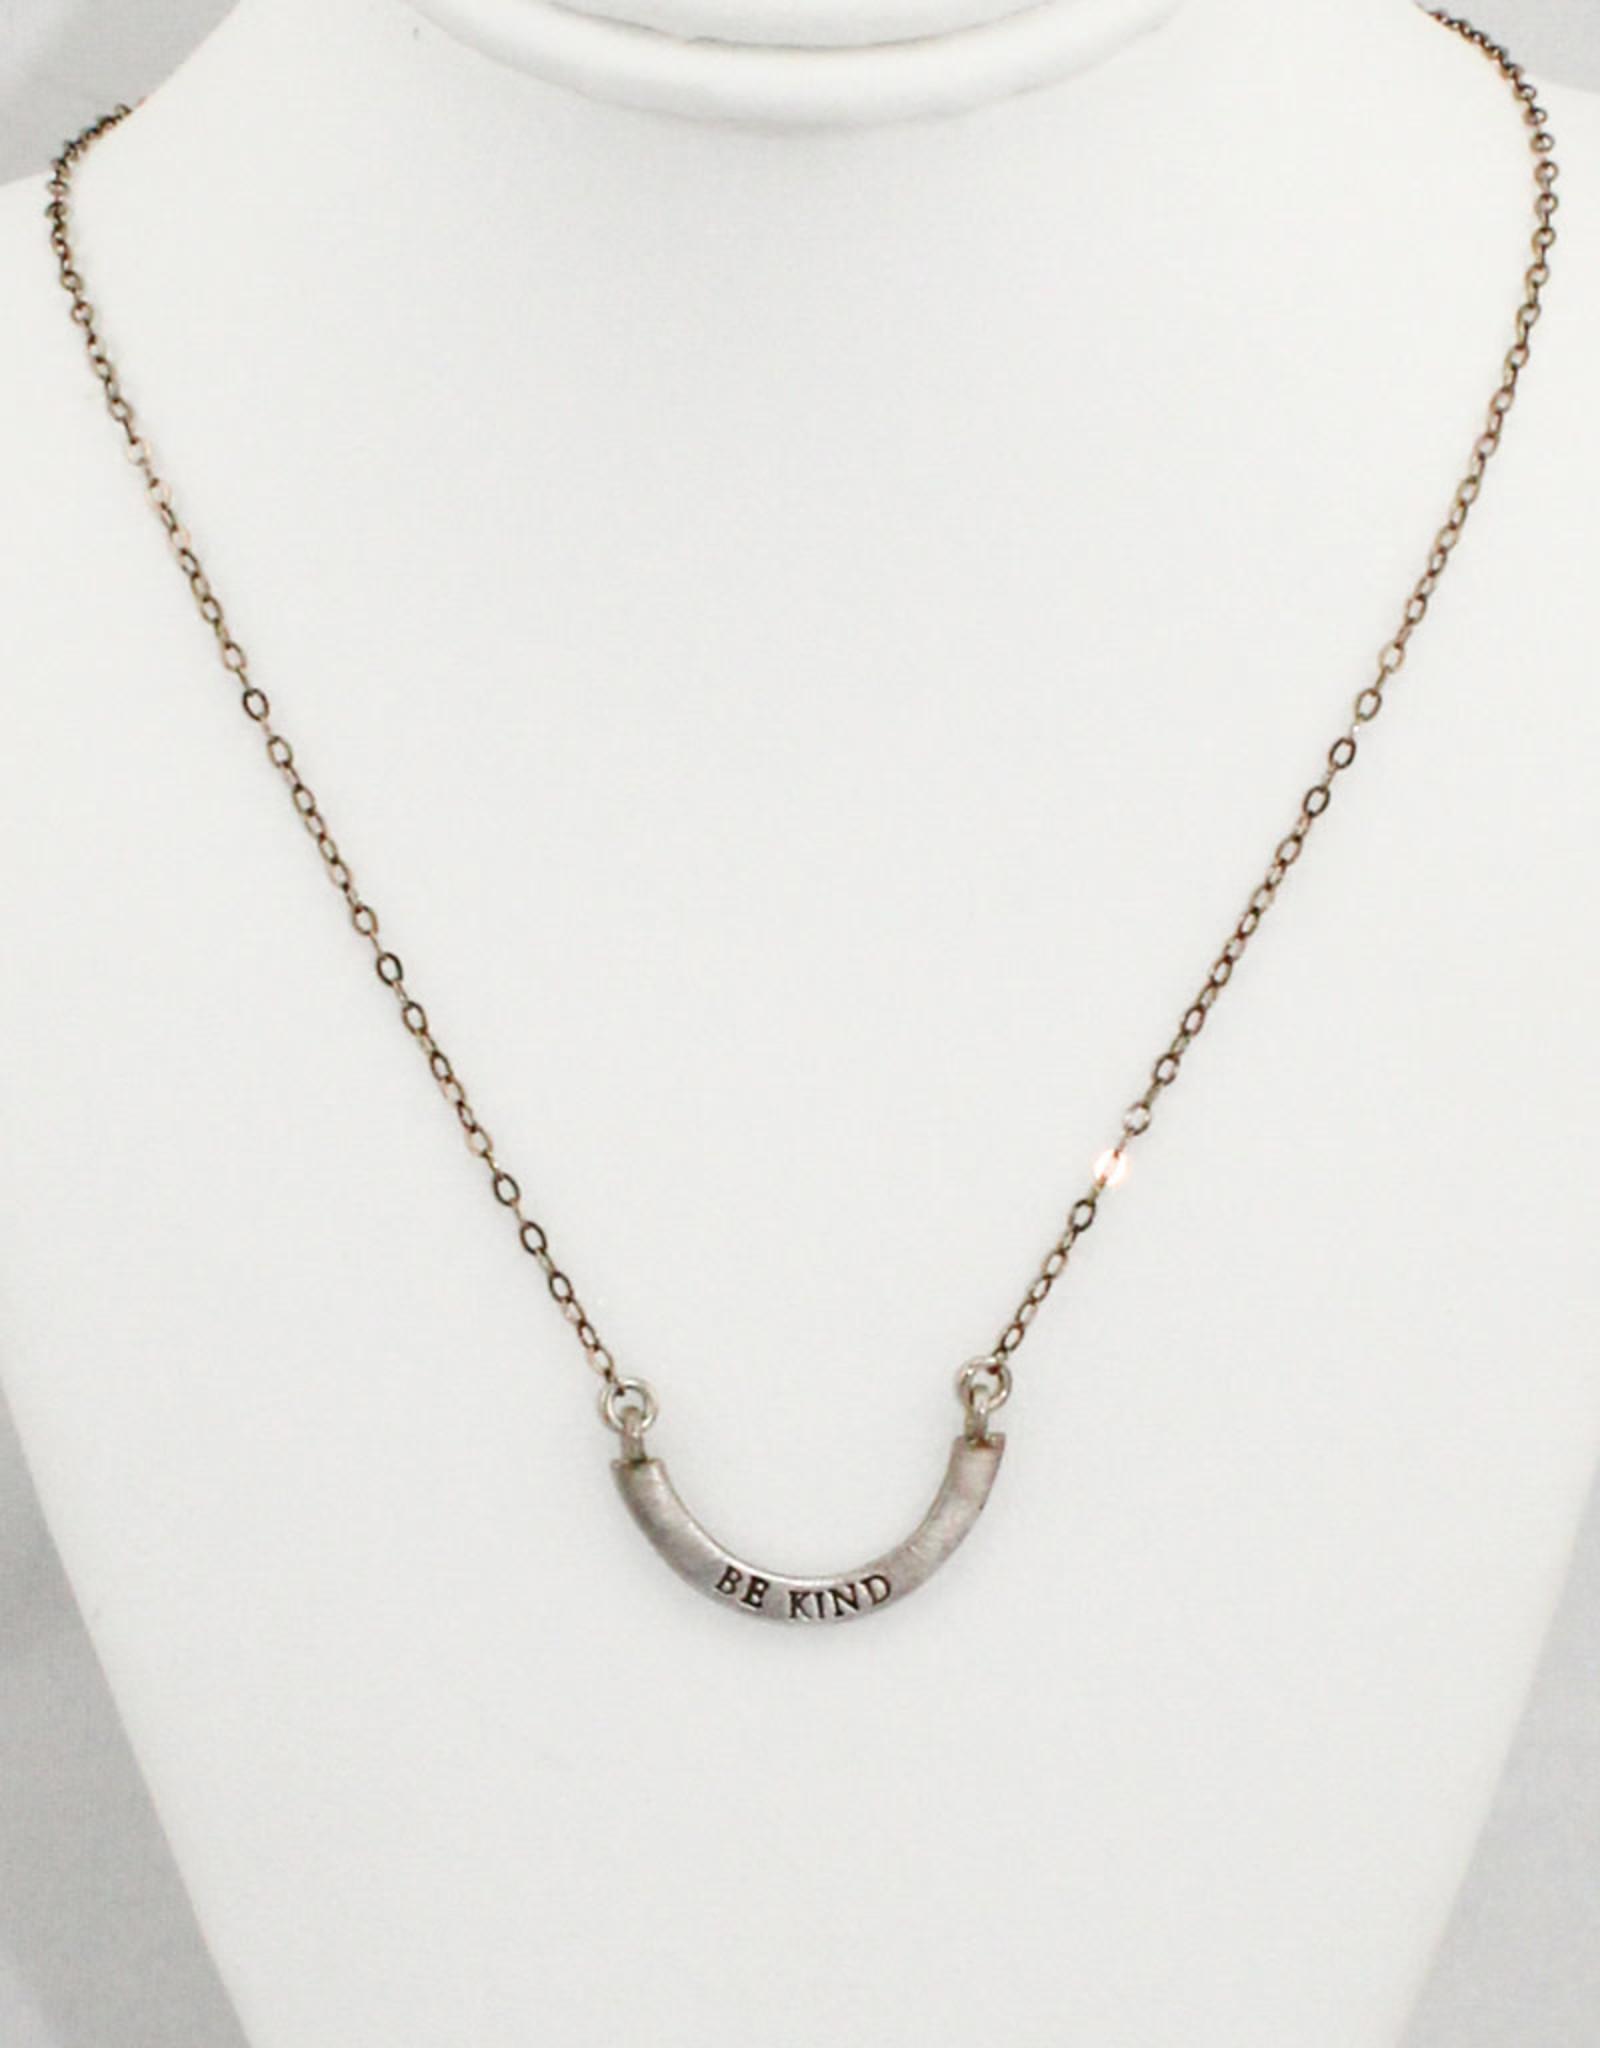 Emily Rosenfeld Be Kind Necklace